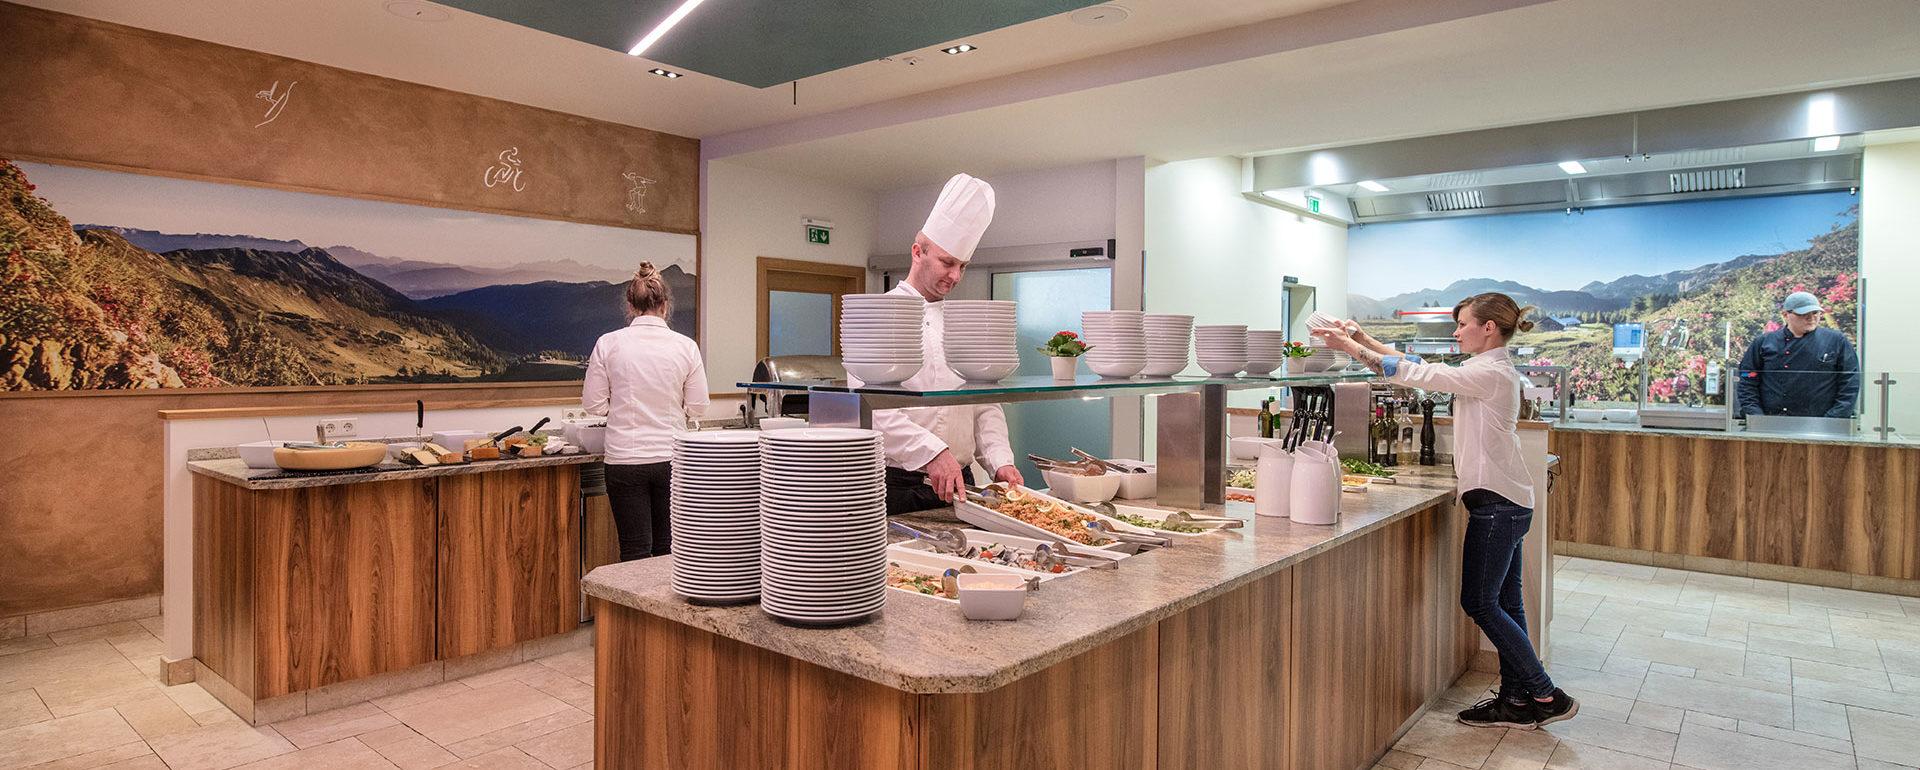 Buffet - Restaurant im Hotel Sportwelt